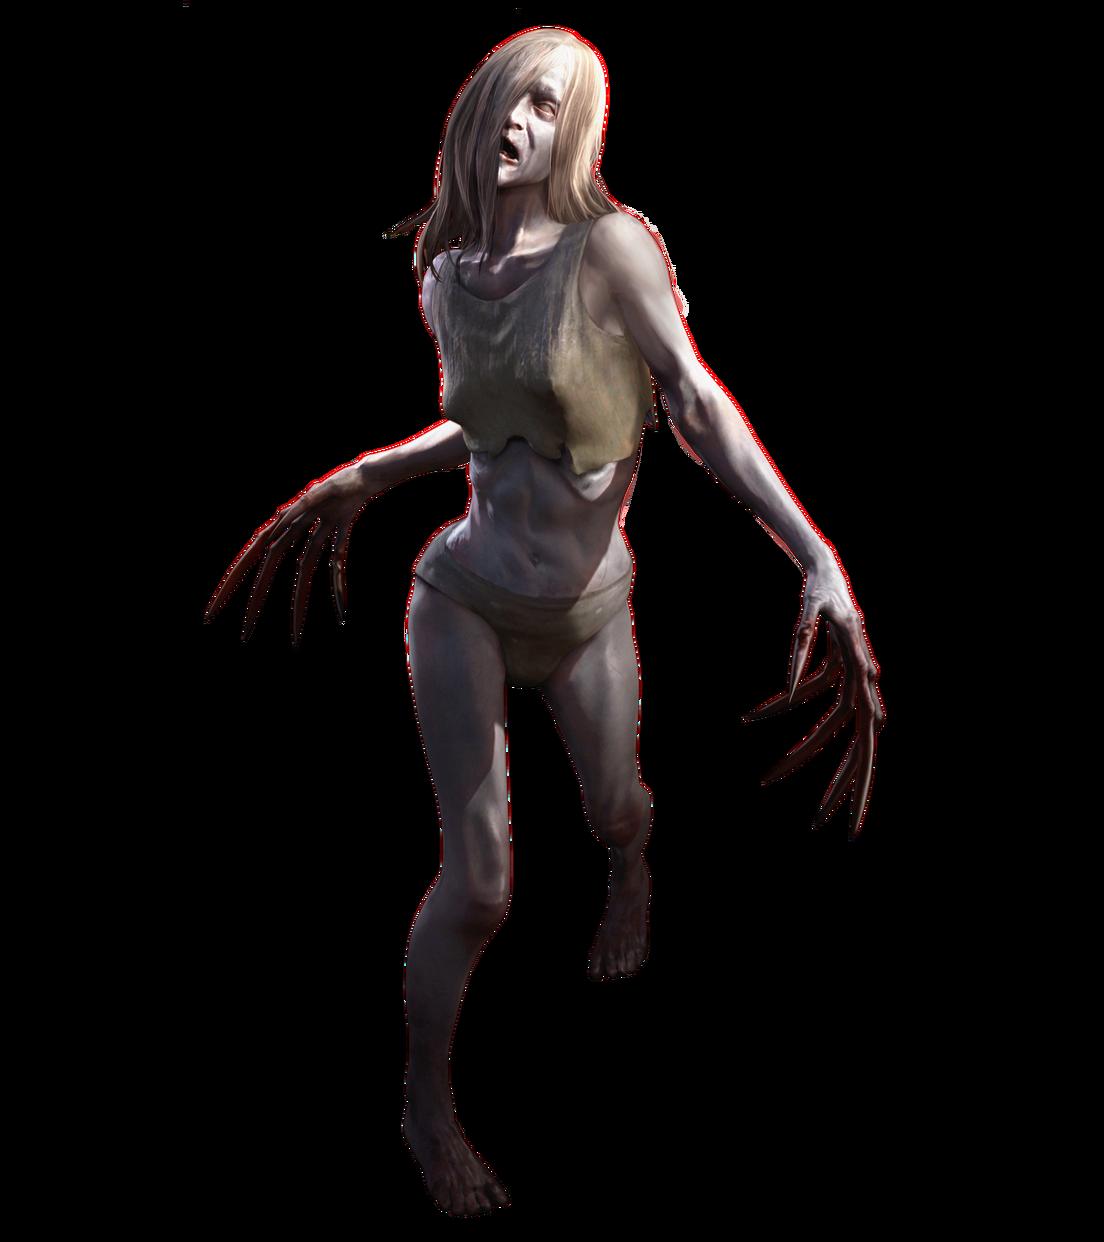 Mujer desnuda espiada photo 22